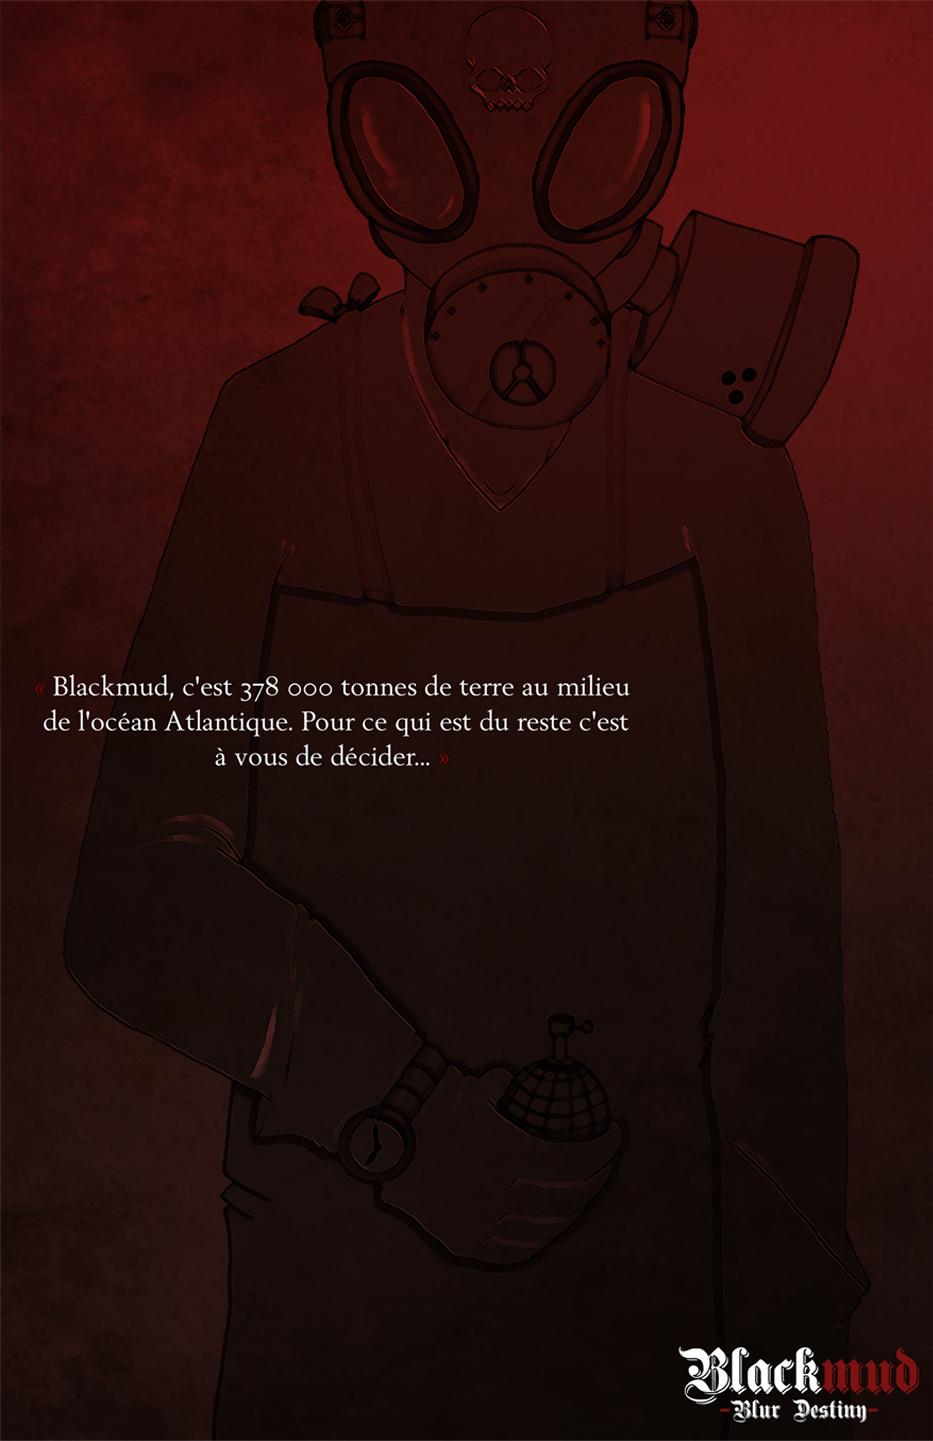 Blackmud: Blur Destiny